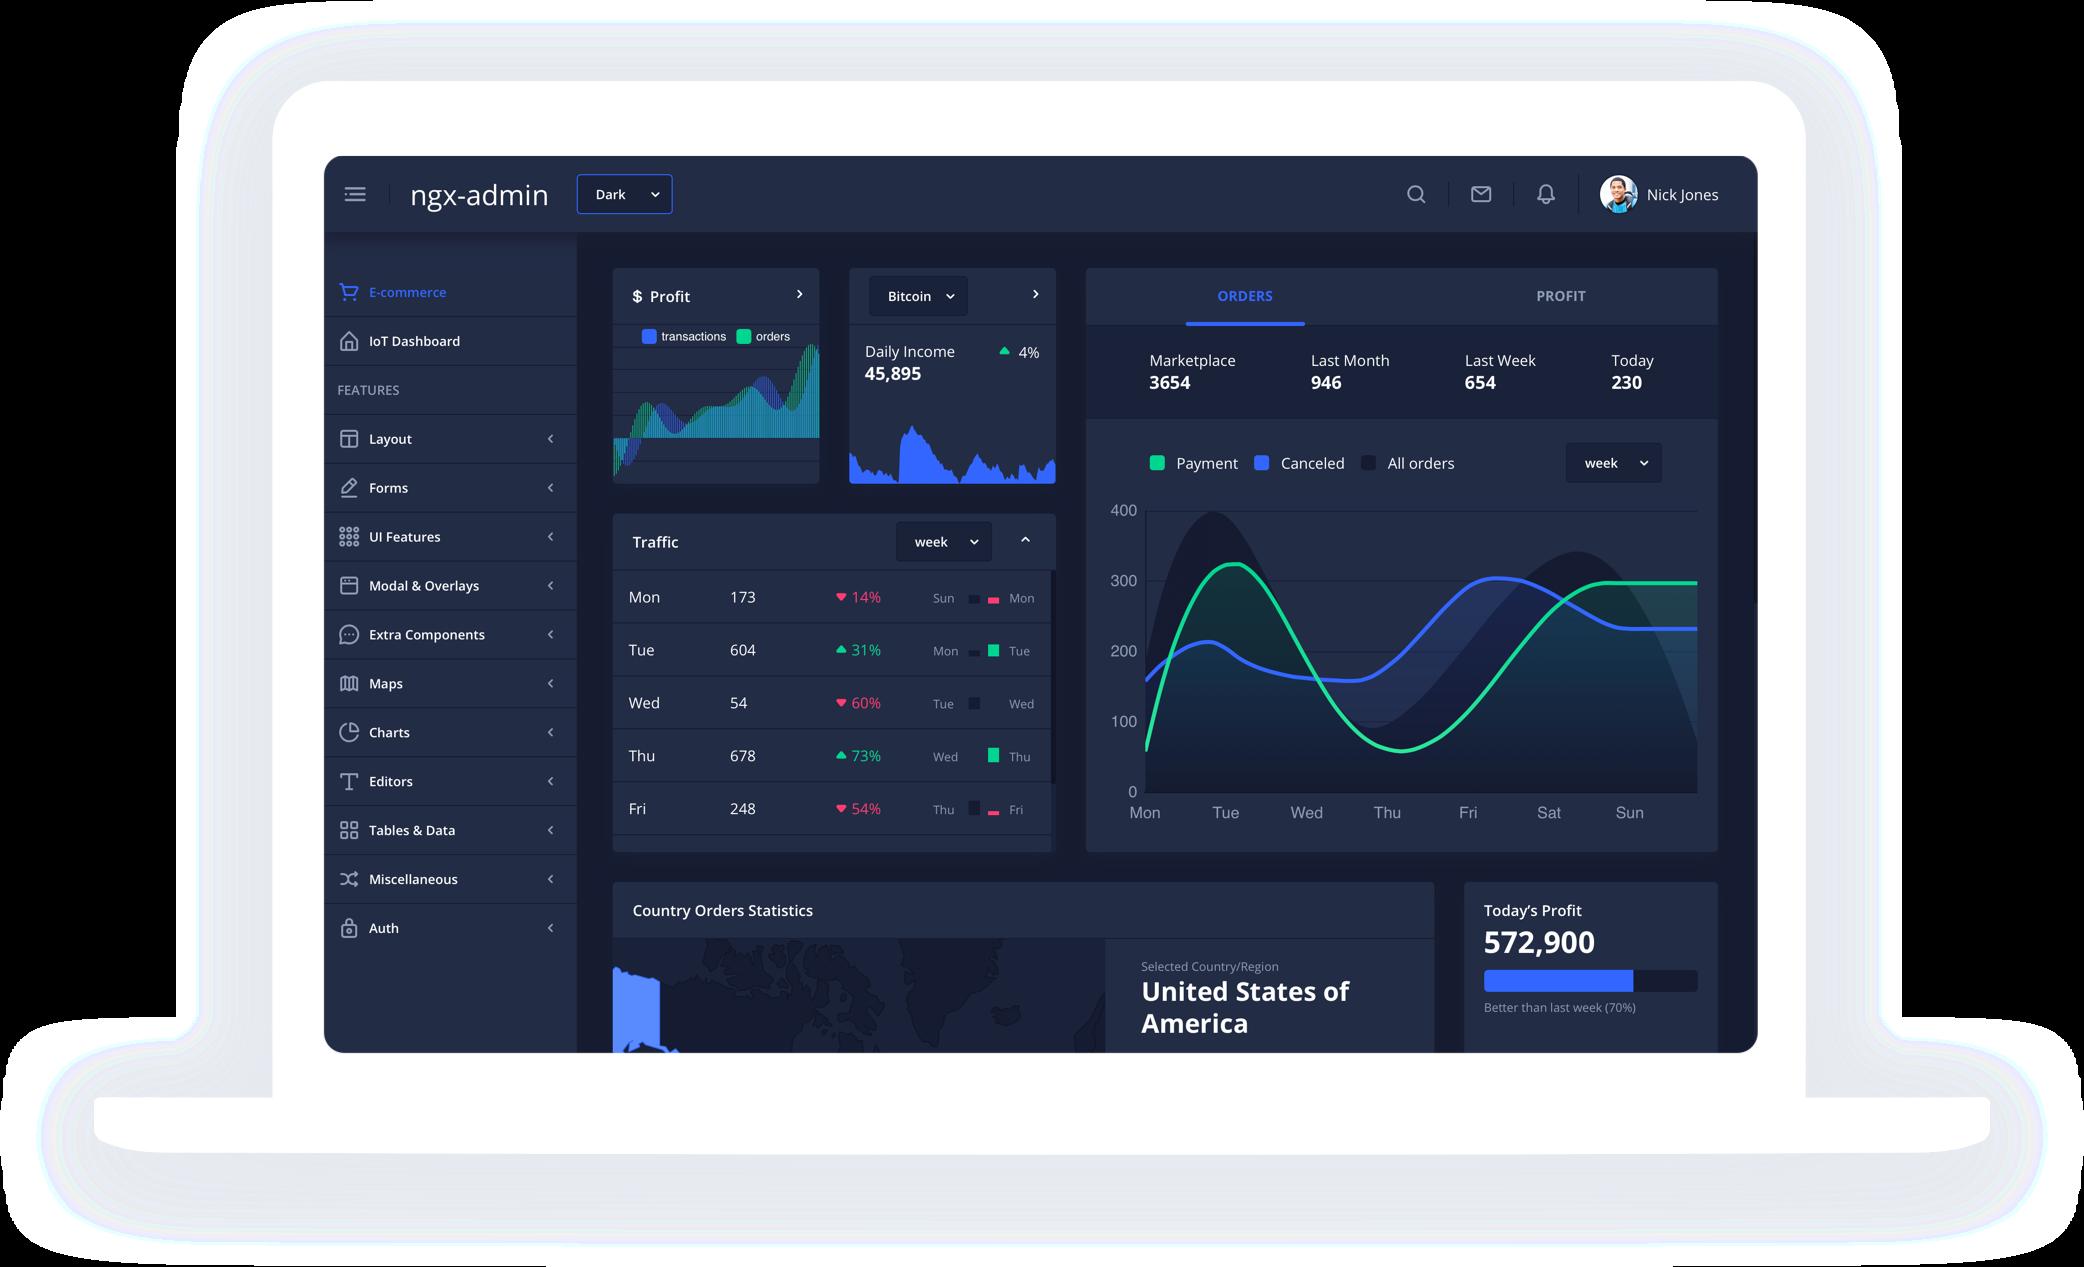 ngx-admin: Free Open Source admin dashboard template based